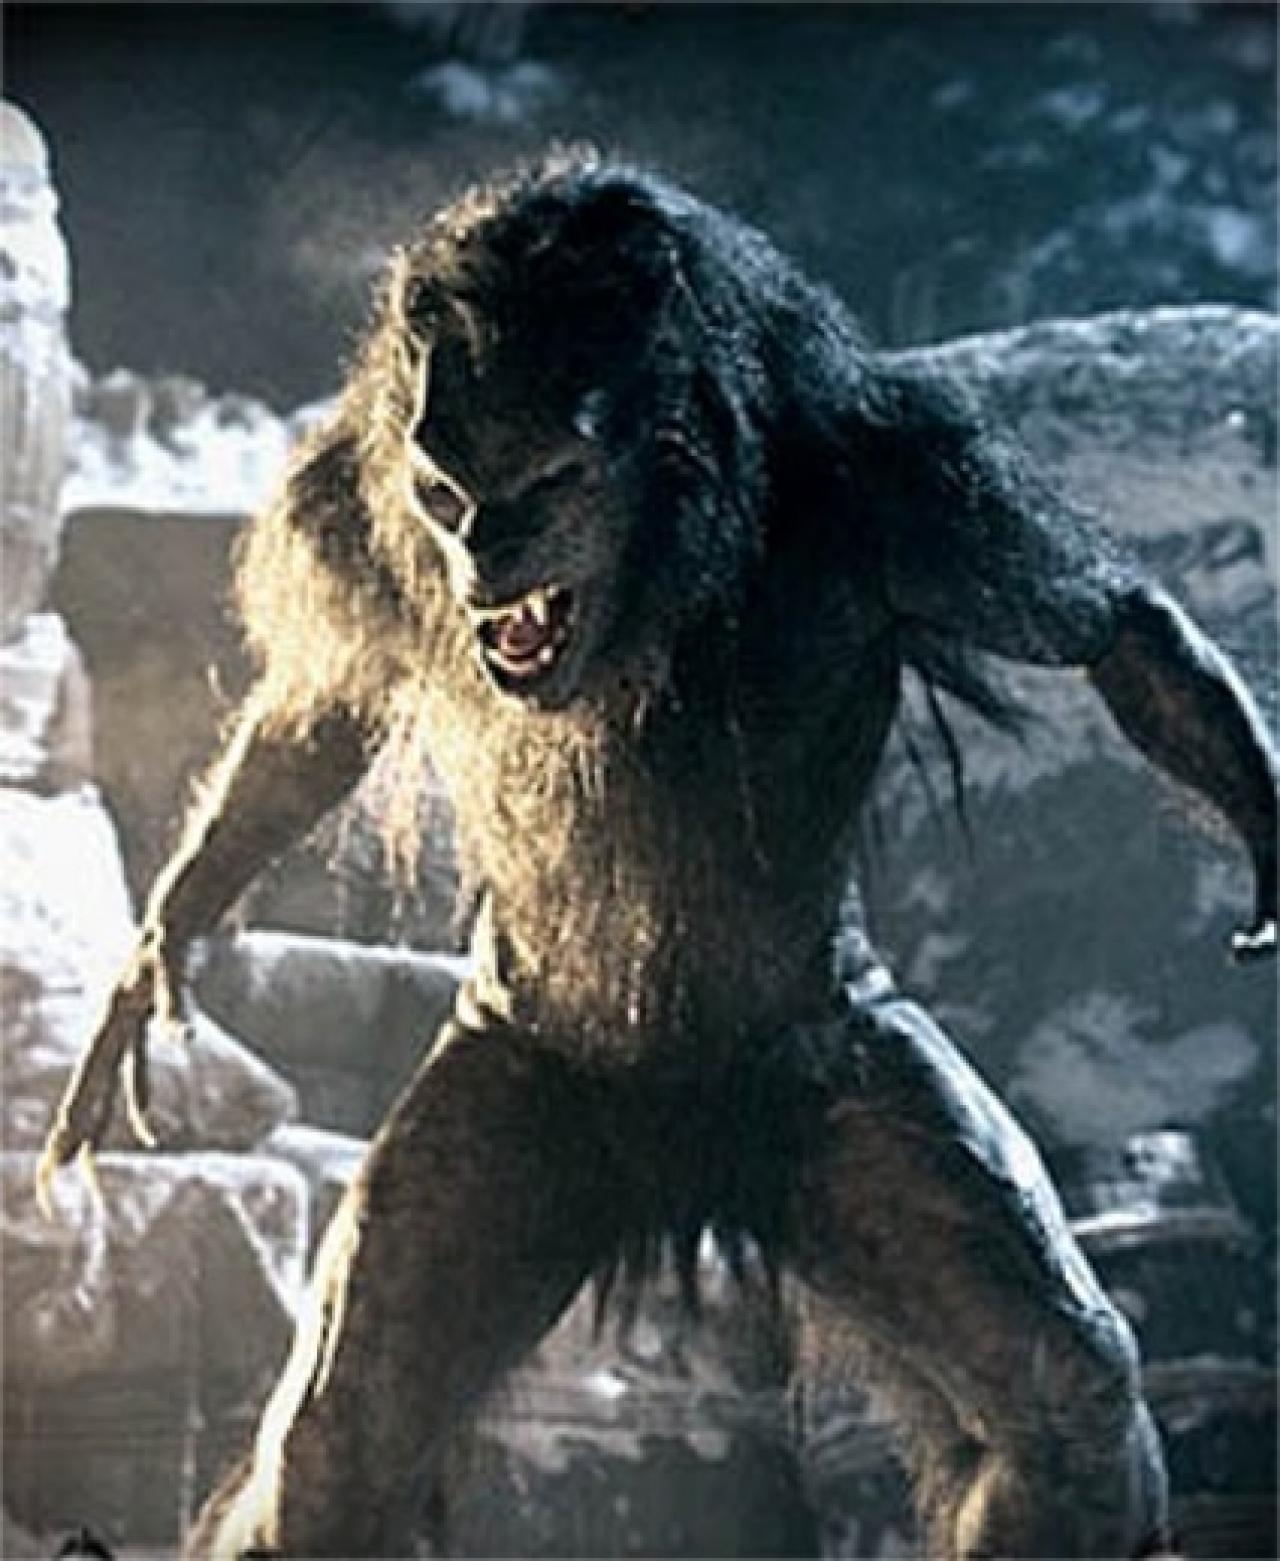 Non nude werewolf nudes nerdy chick